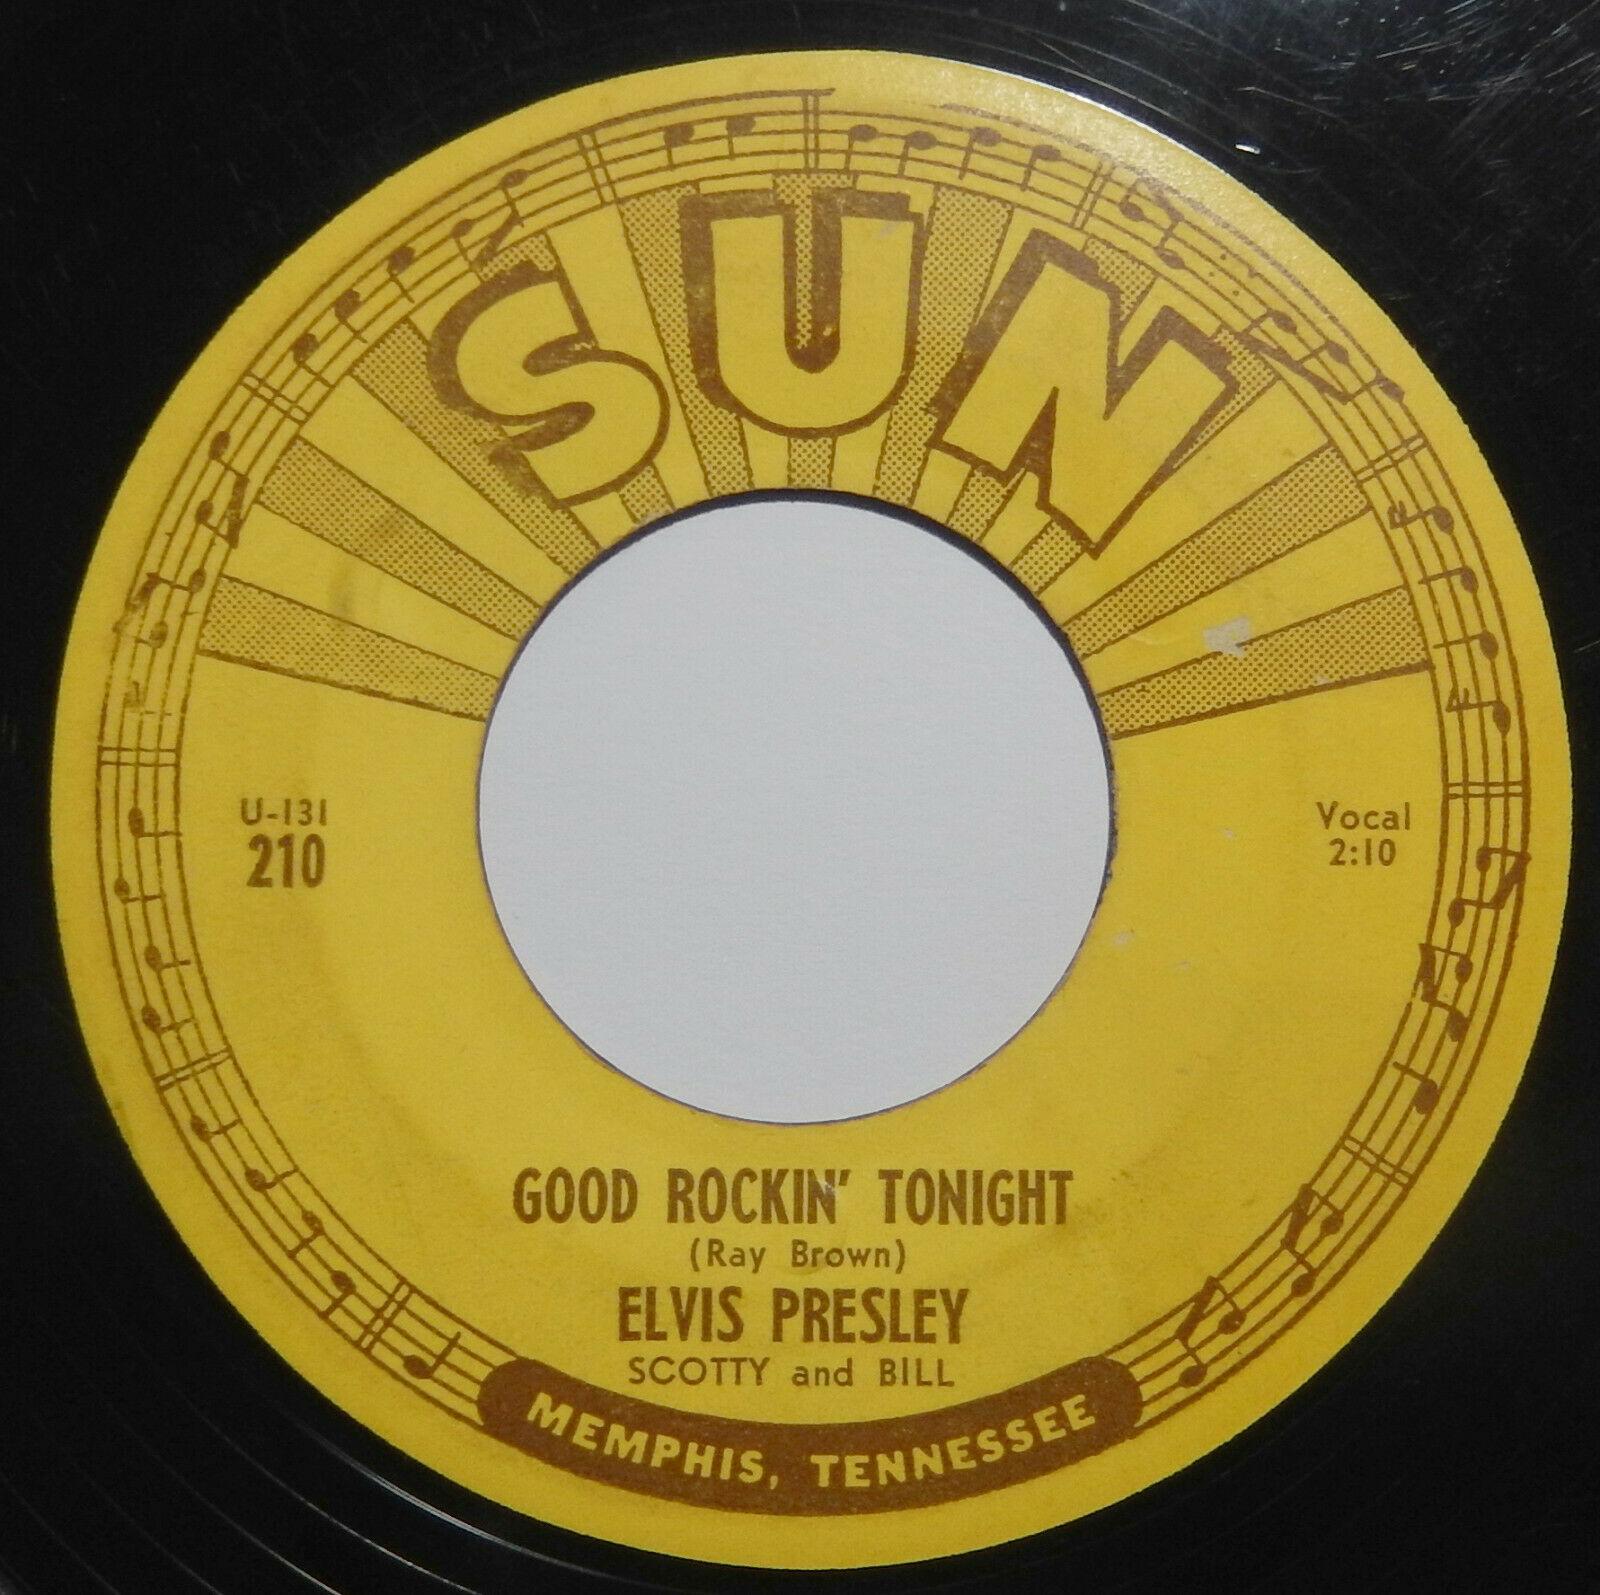 ELVIS PRESLEY Good Rockin  Tonight SUN 210 45 rpm RARE ORIGINAL WITH PUSH MARKS